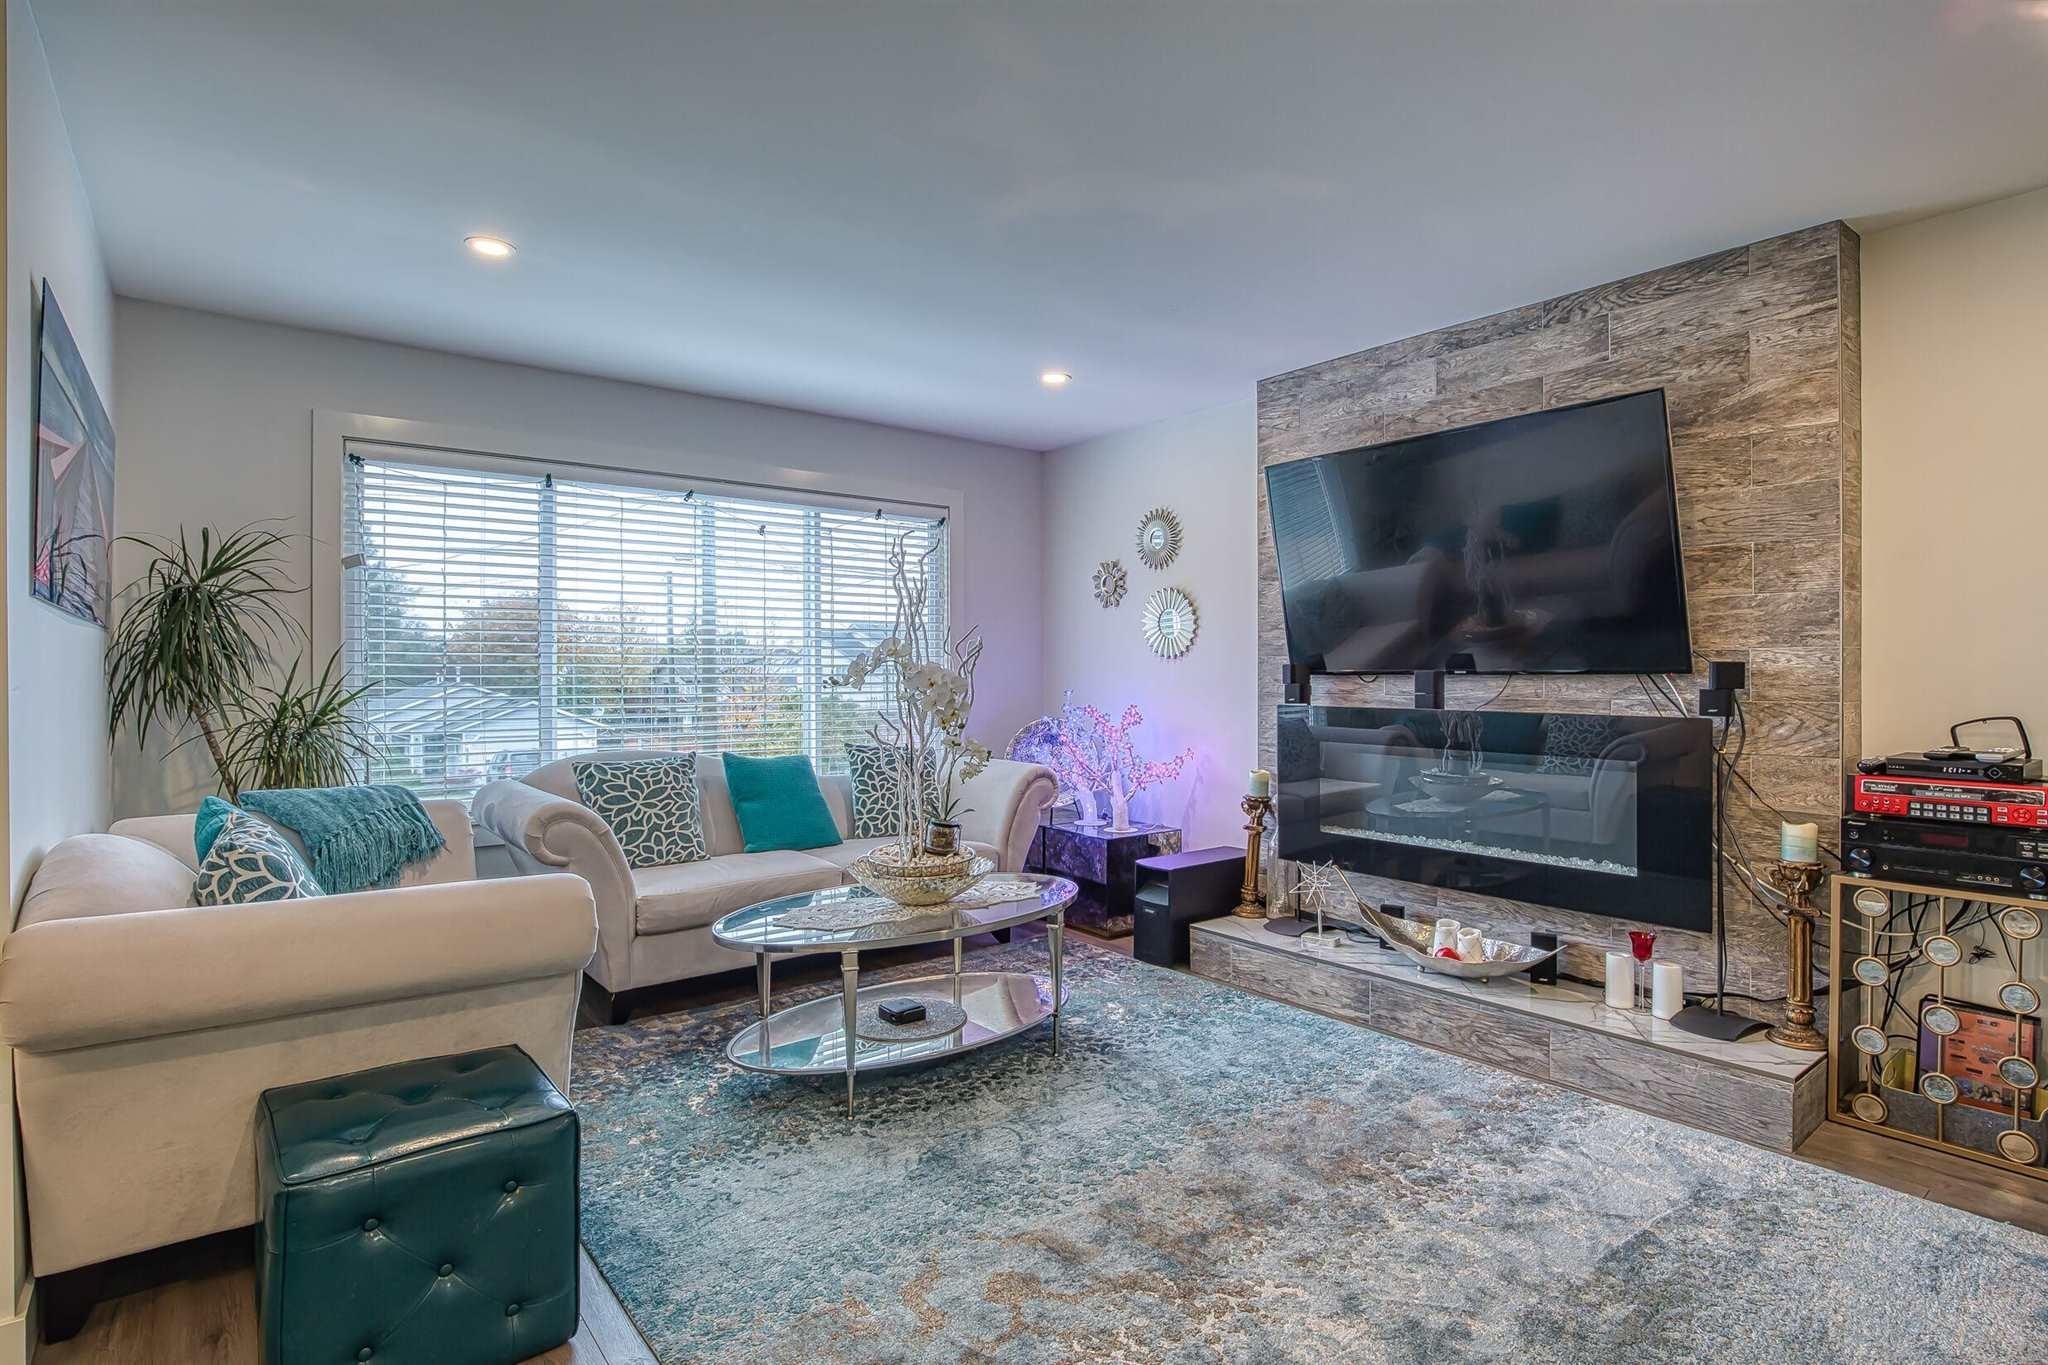 11672 203 STREET - Southwest Maple Ridge House/Single Family for sale, 5 Bedrooms (R2607010)